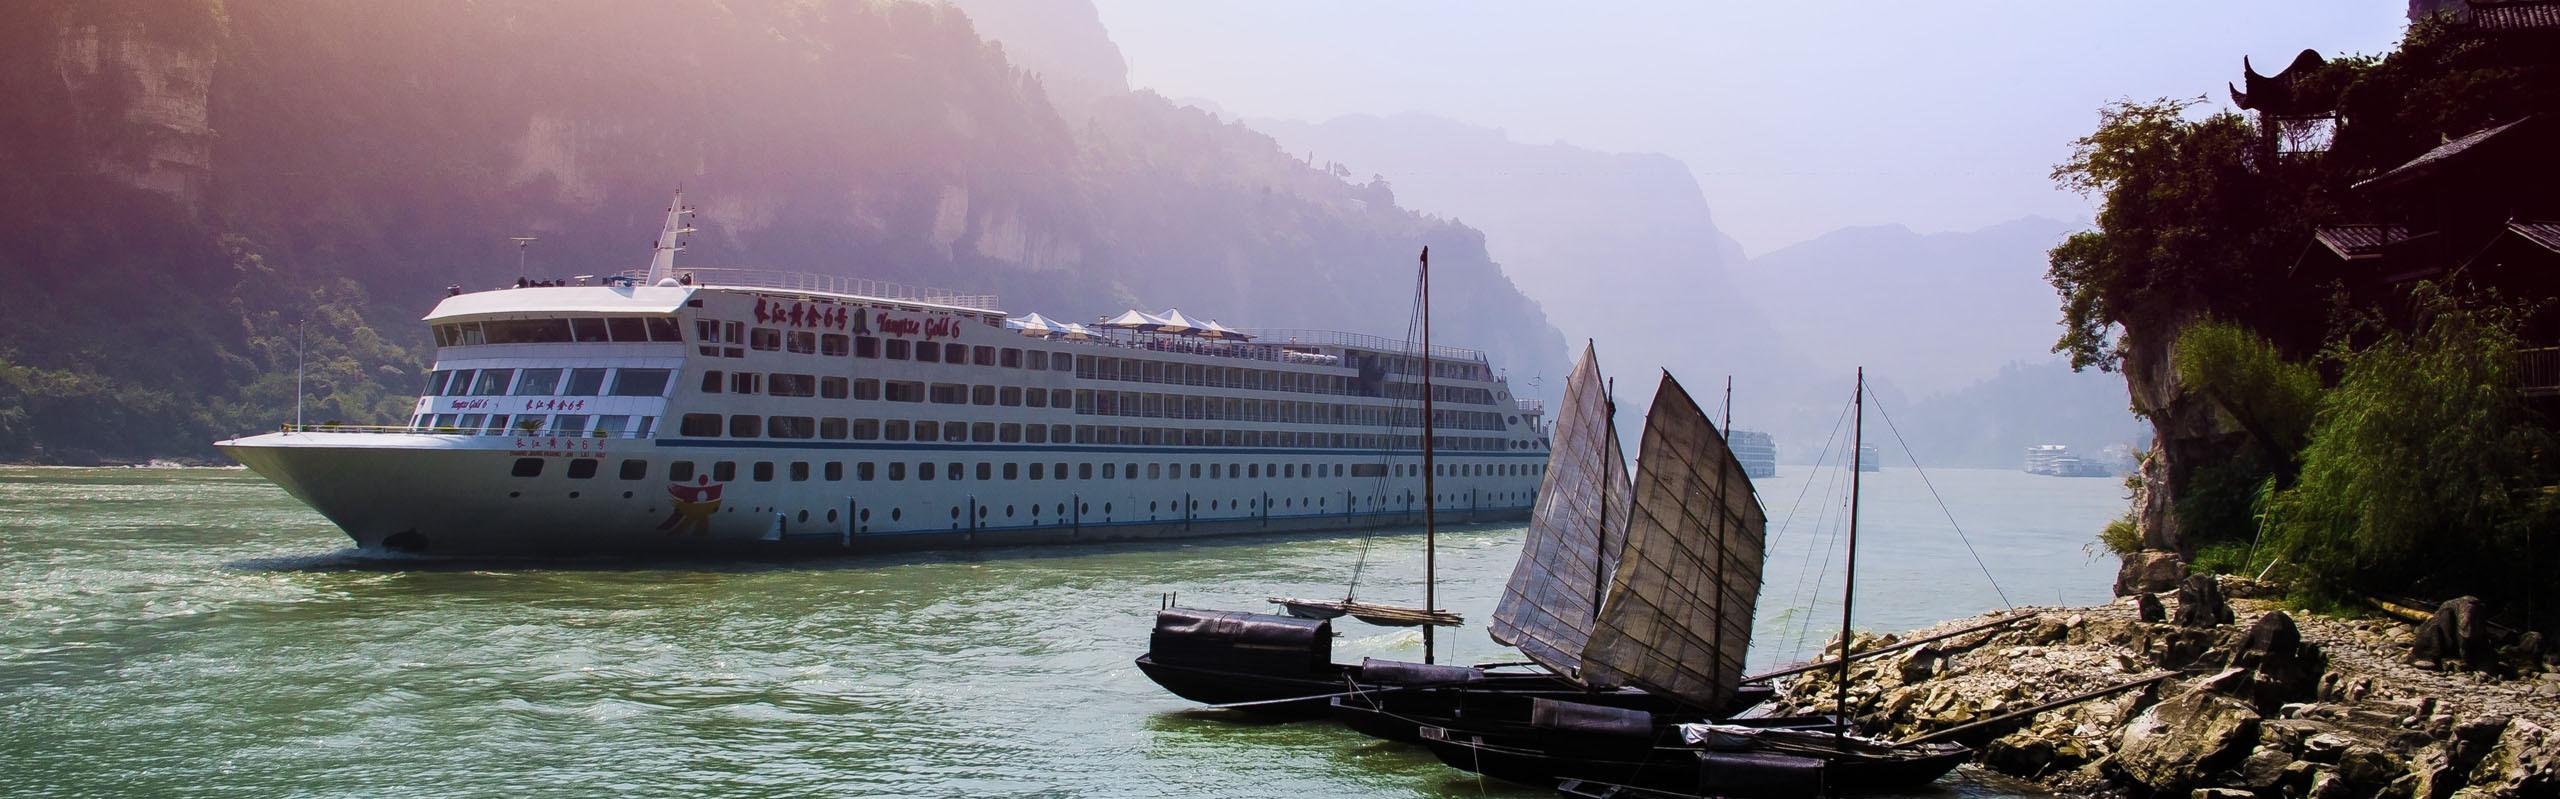 Yangtze River Cruise 2021/2022